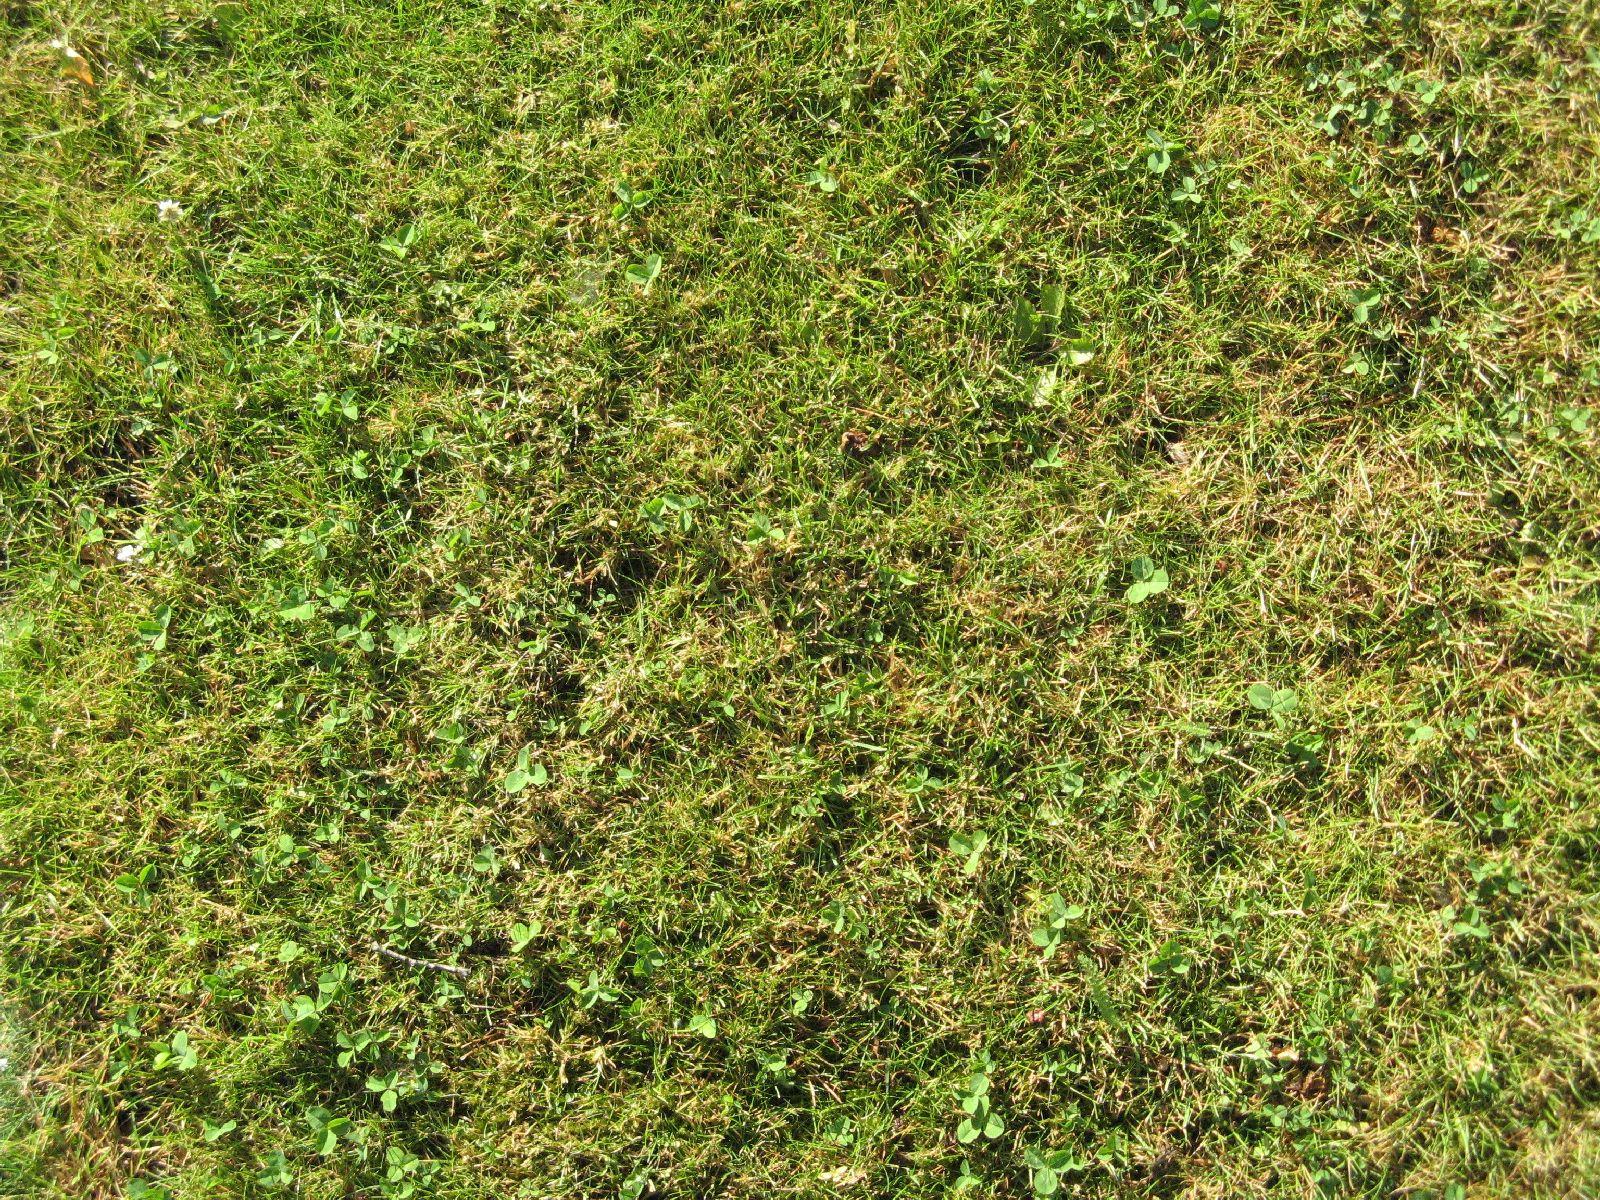 Boden-Gras-Moos-Blumen_Textur_B_00762